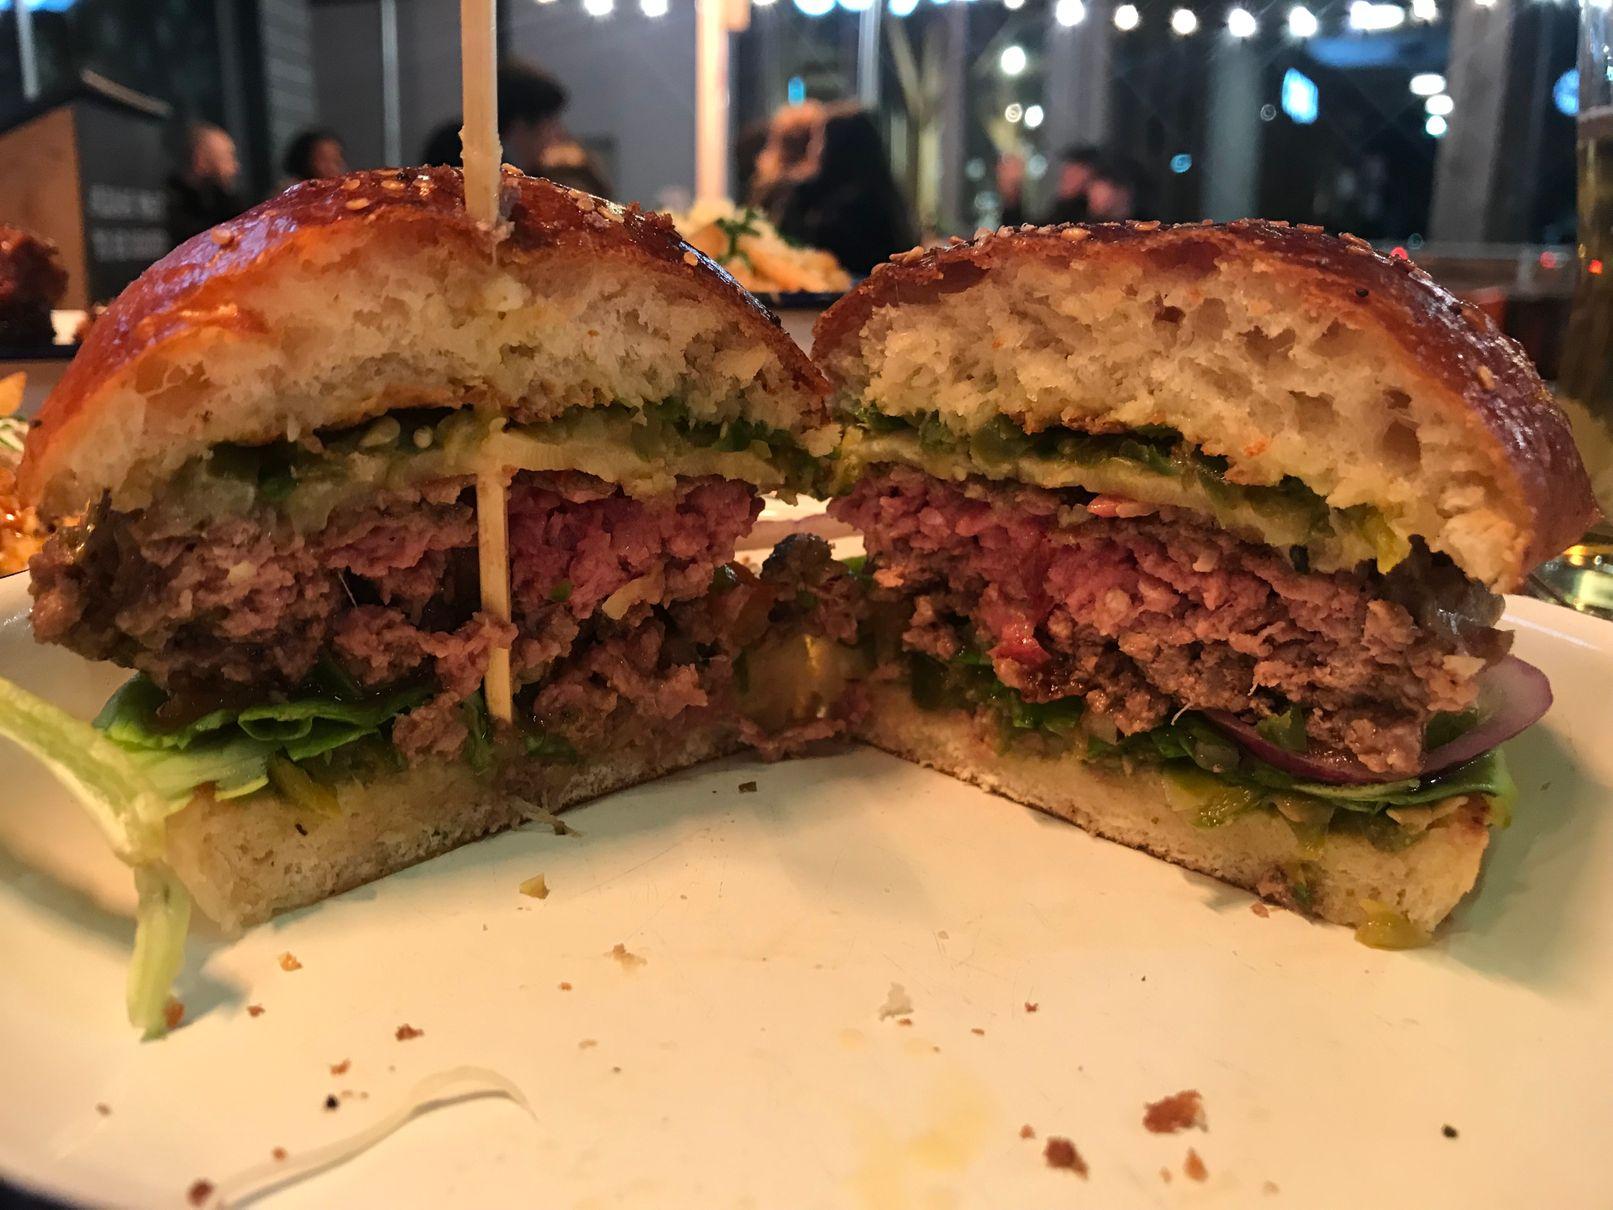 Burger at Beefy Boys Hereford